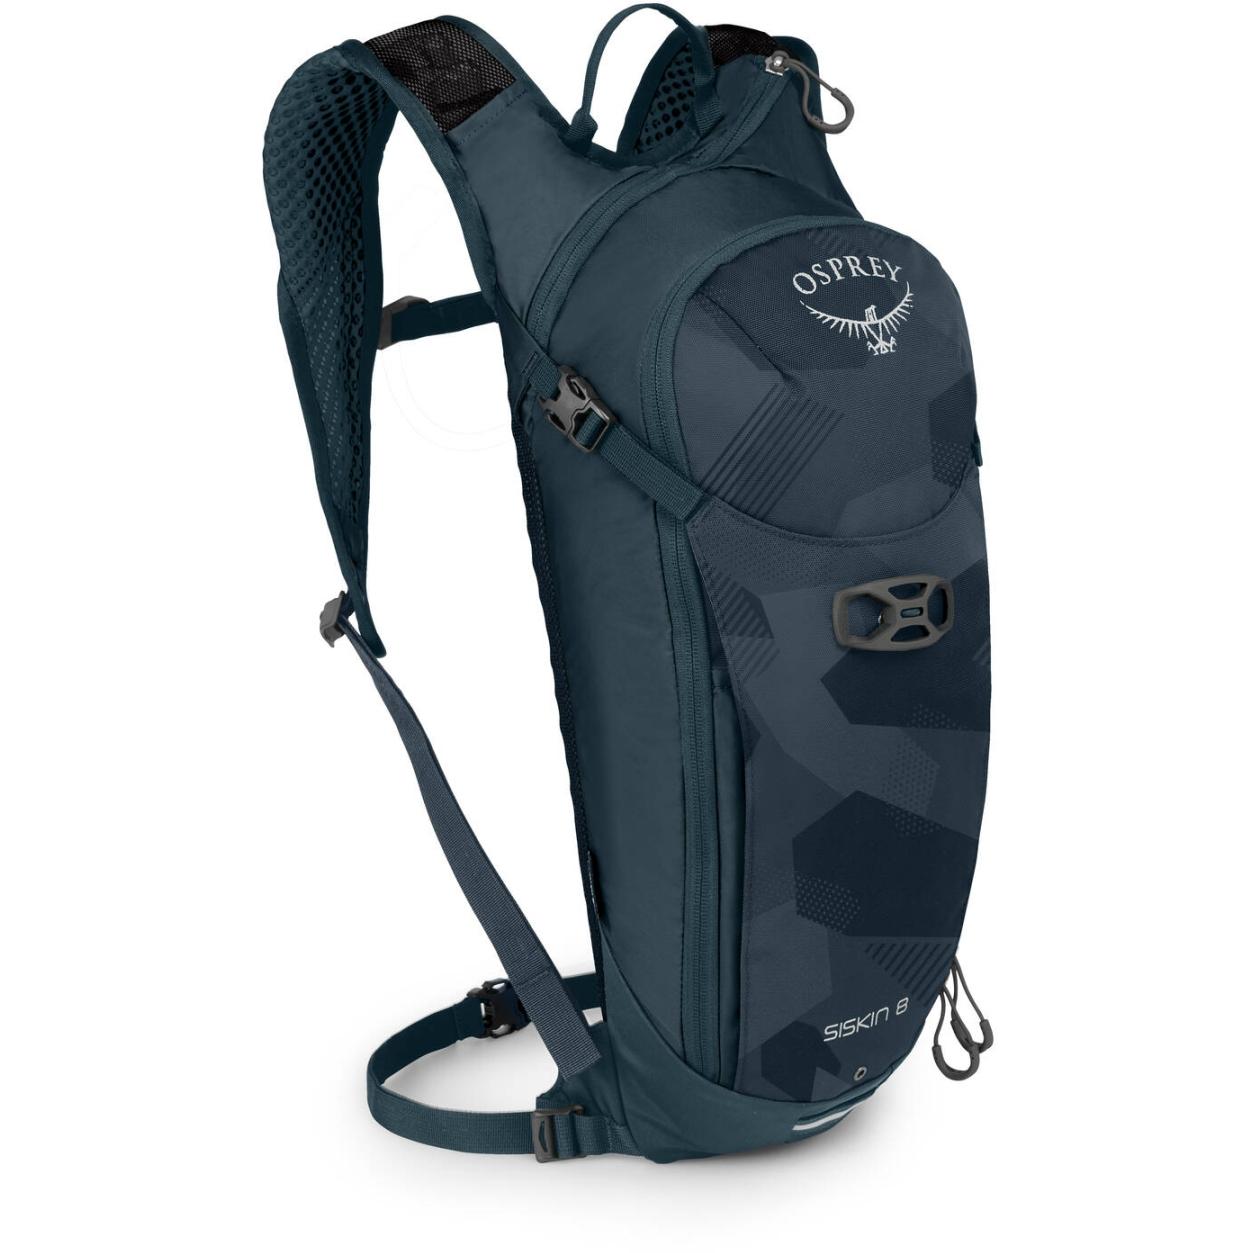 Osprey Siskin 8 Hydration Backpack - Slate Blue